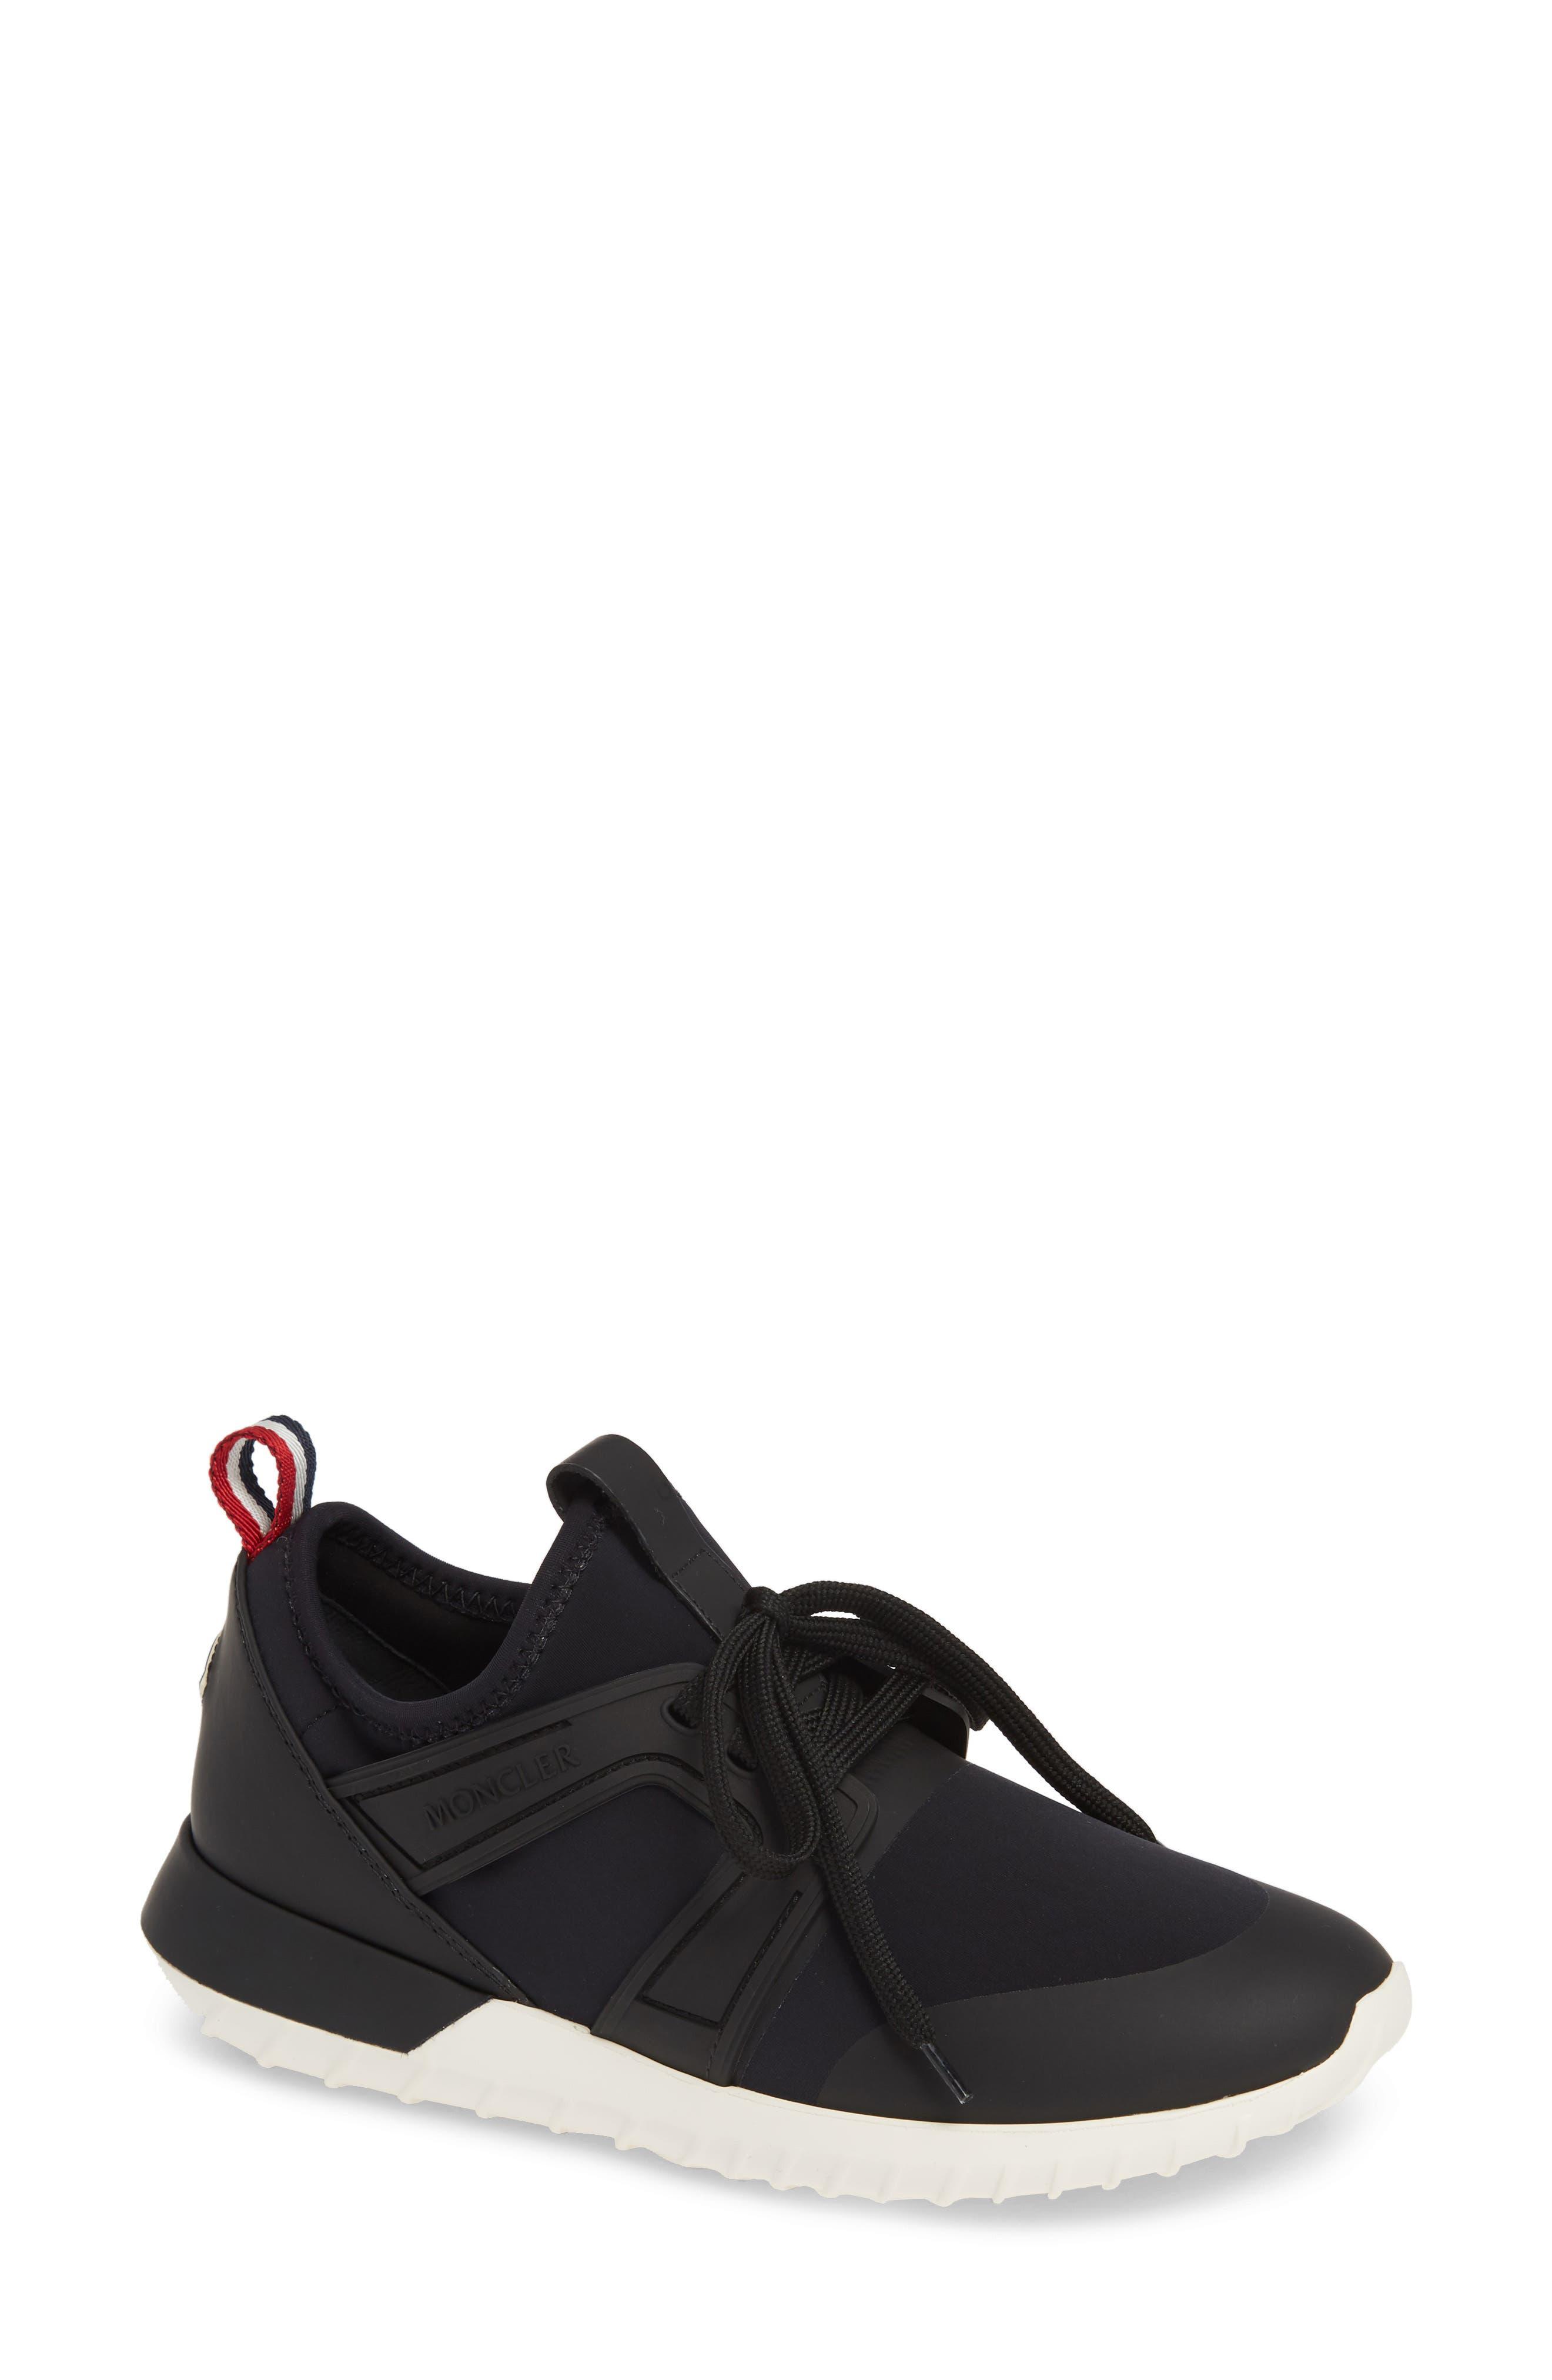 MONCLER Meline Scarpa Sneaker, Main, color, BLACK